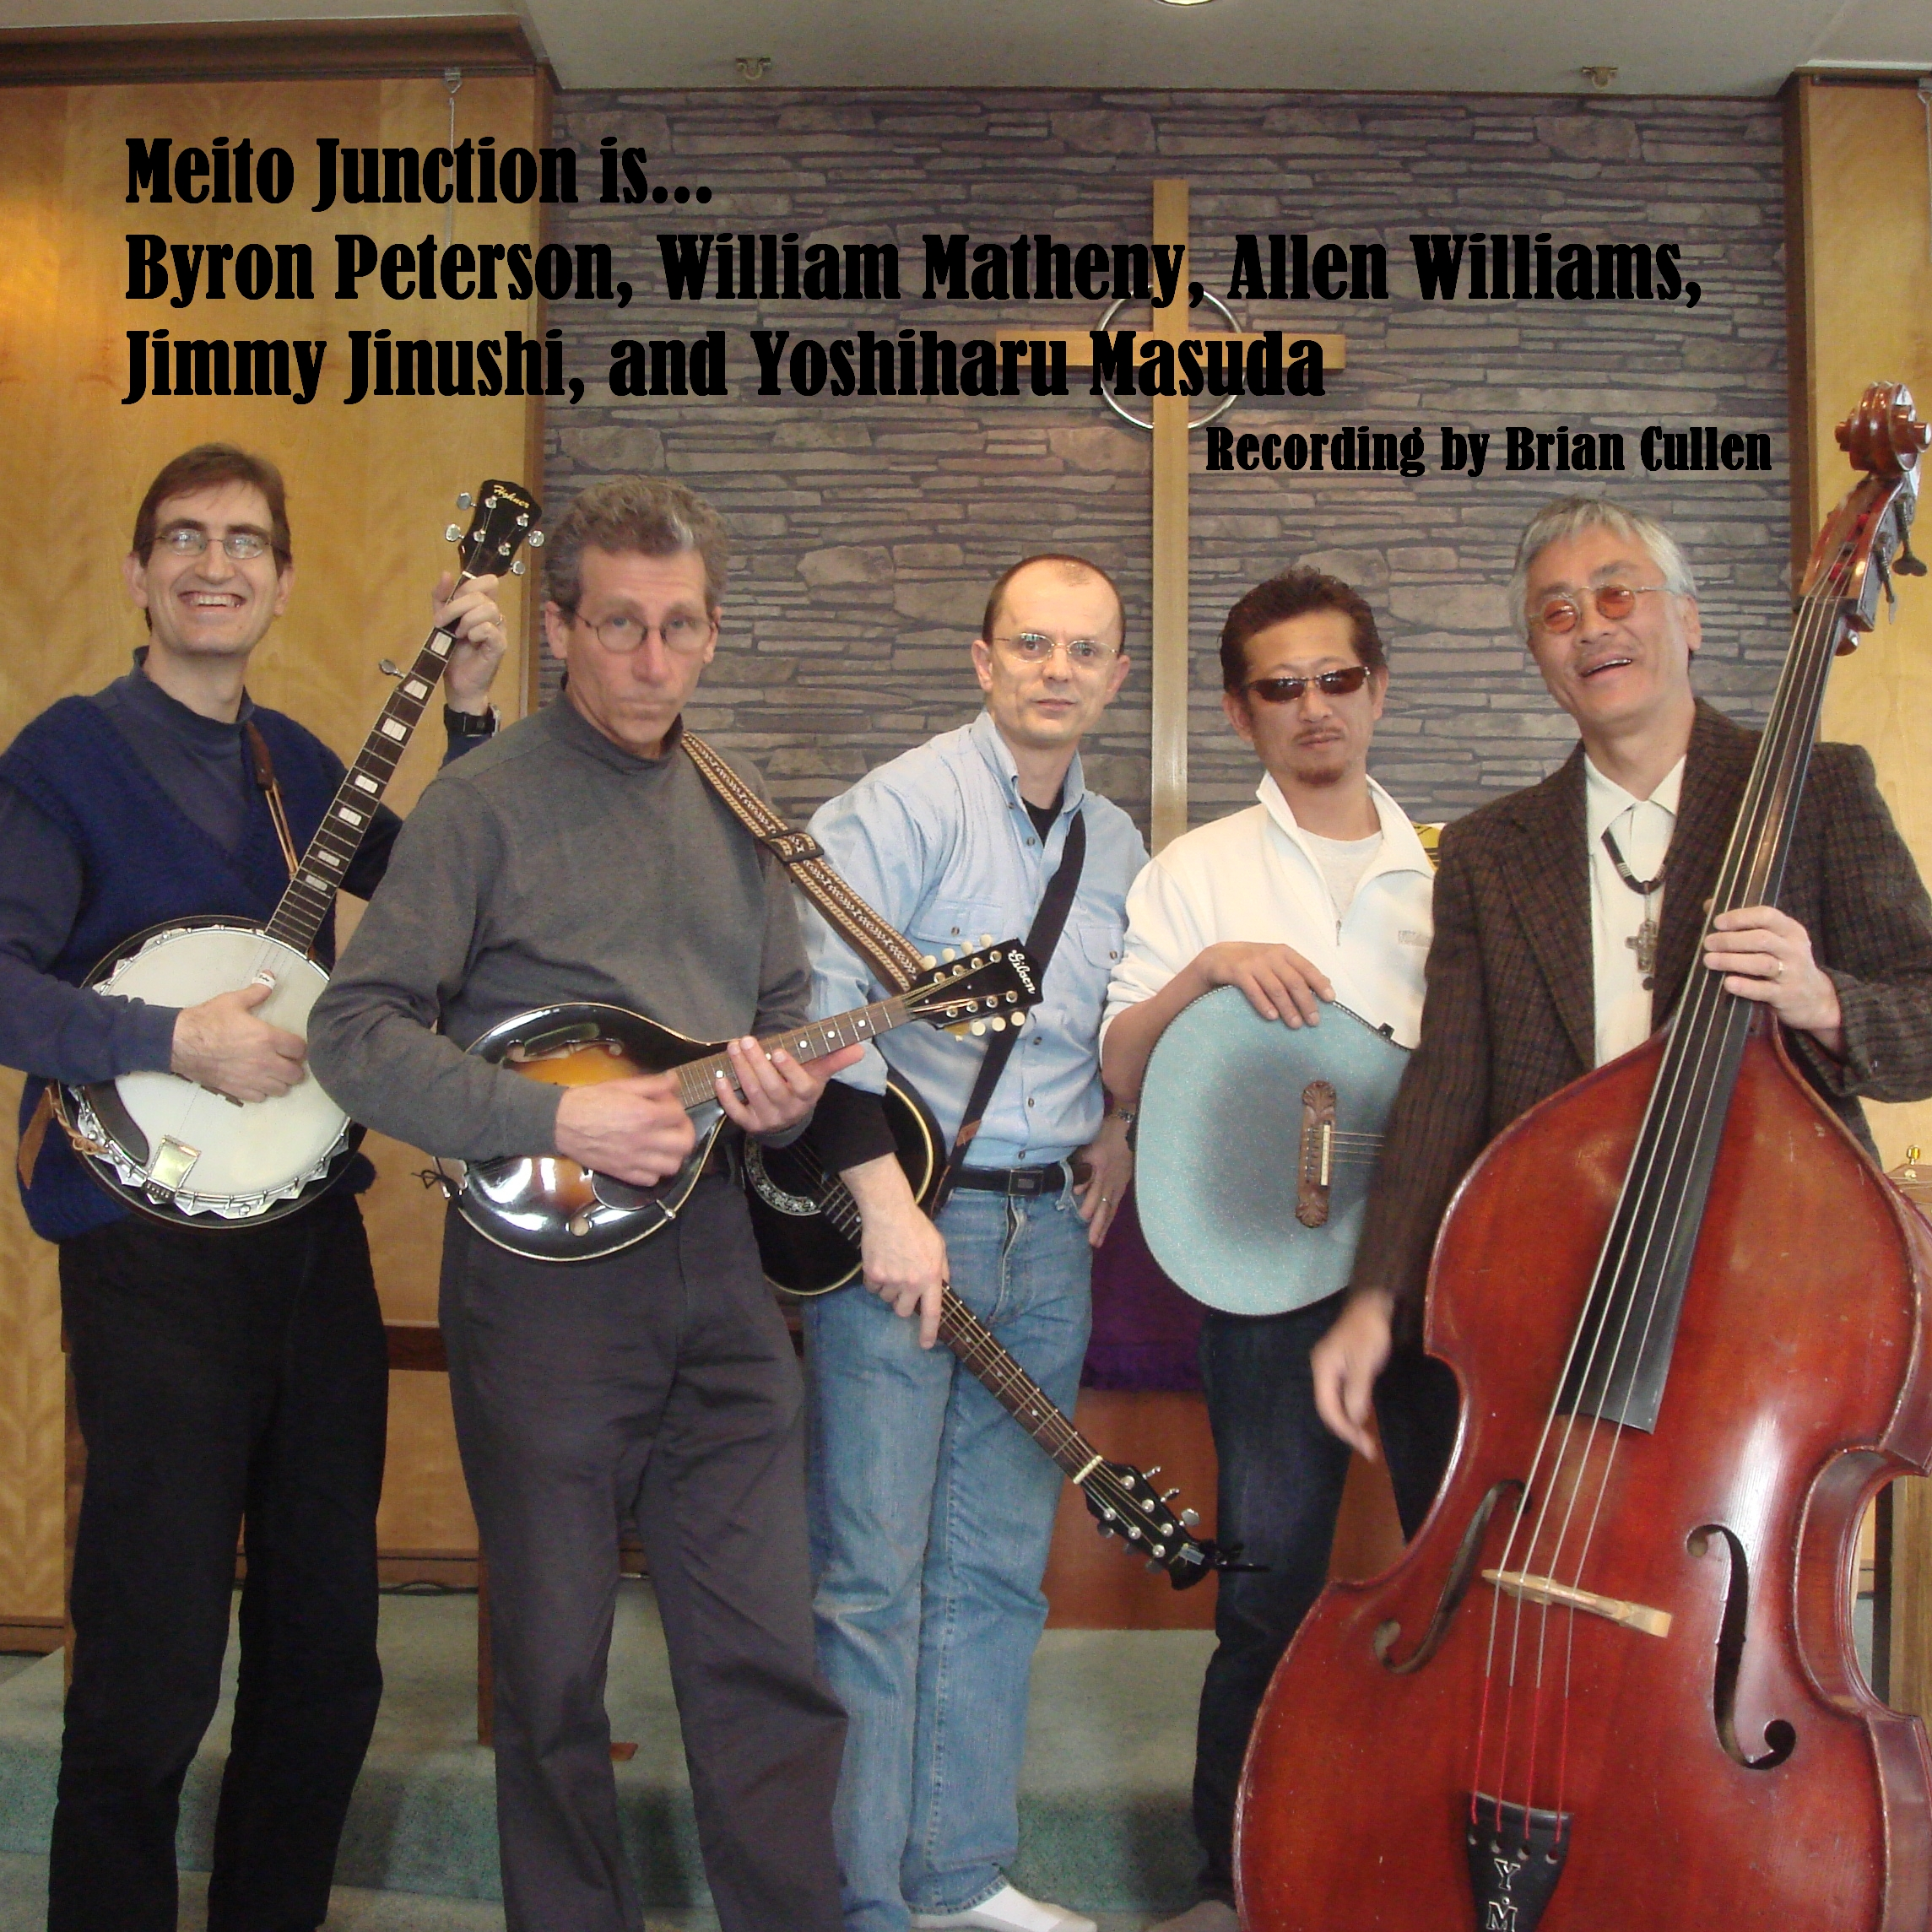 Byron Peterson, William Matheny, Allen Williams, Jimmy Jinushi, Yoshiharu Masuda